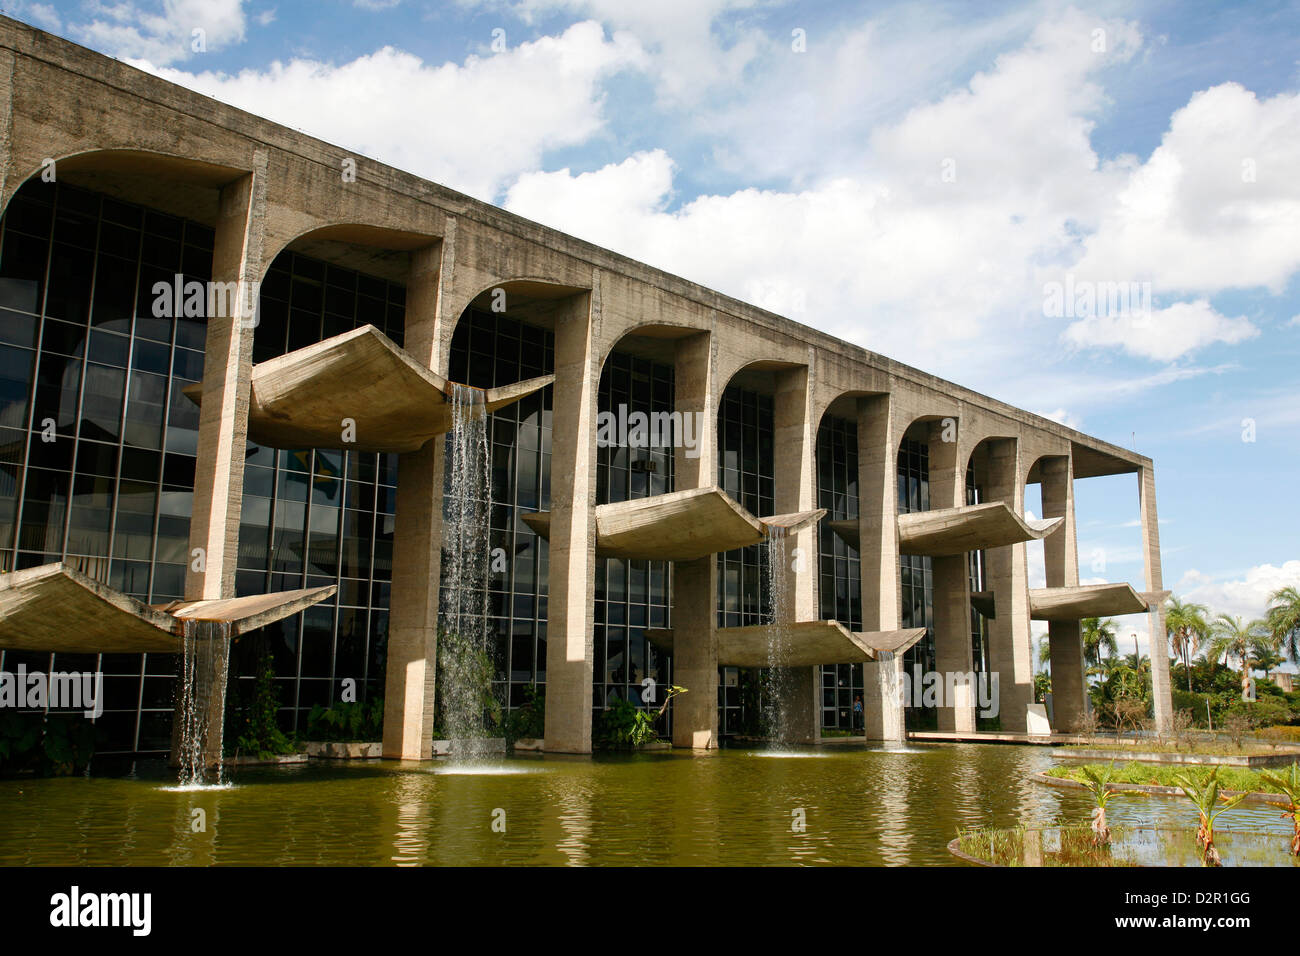 Palacio da Justica, Brasilia, UNESCO World Heritage Site, Brazil, South America - Stock Image